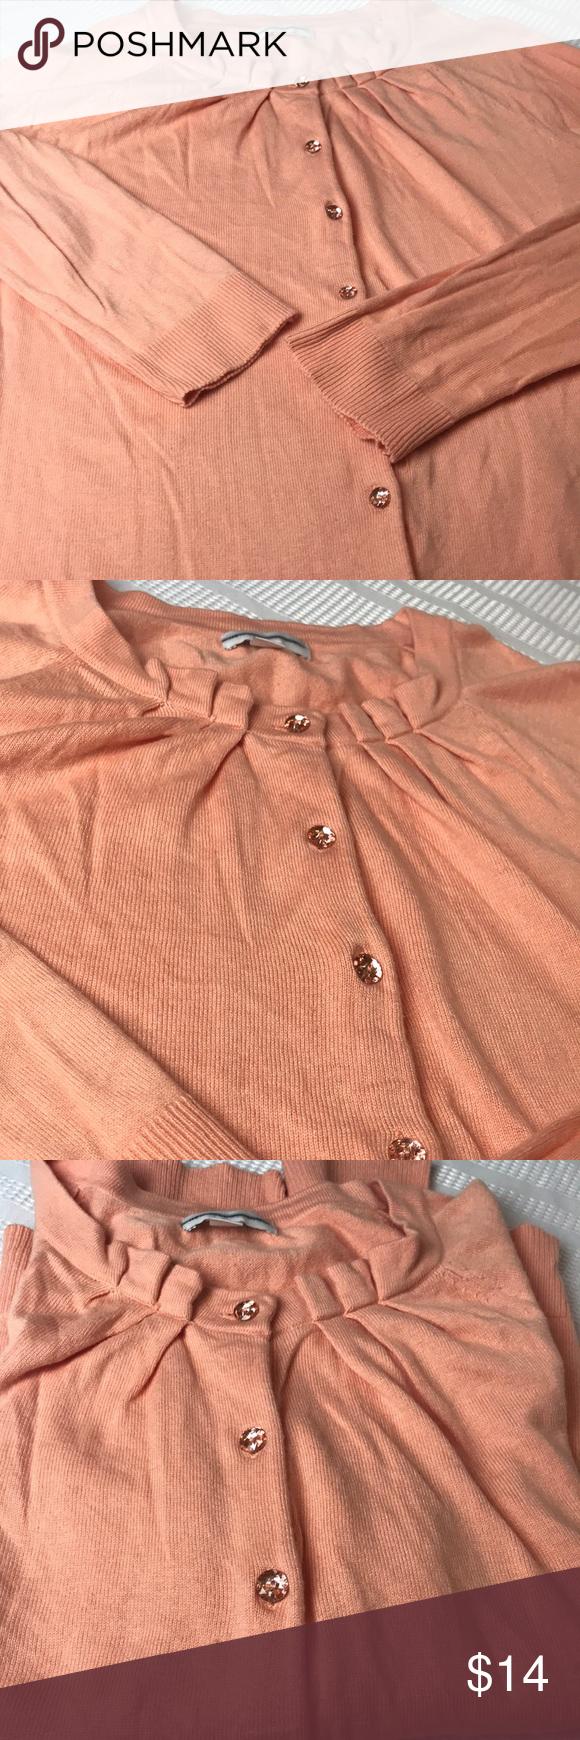 Women's peach color twin set style sweater | Peach colors, Liz ...